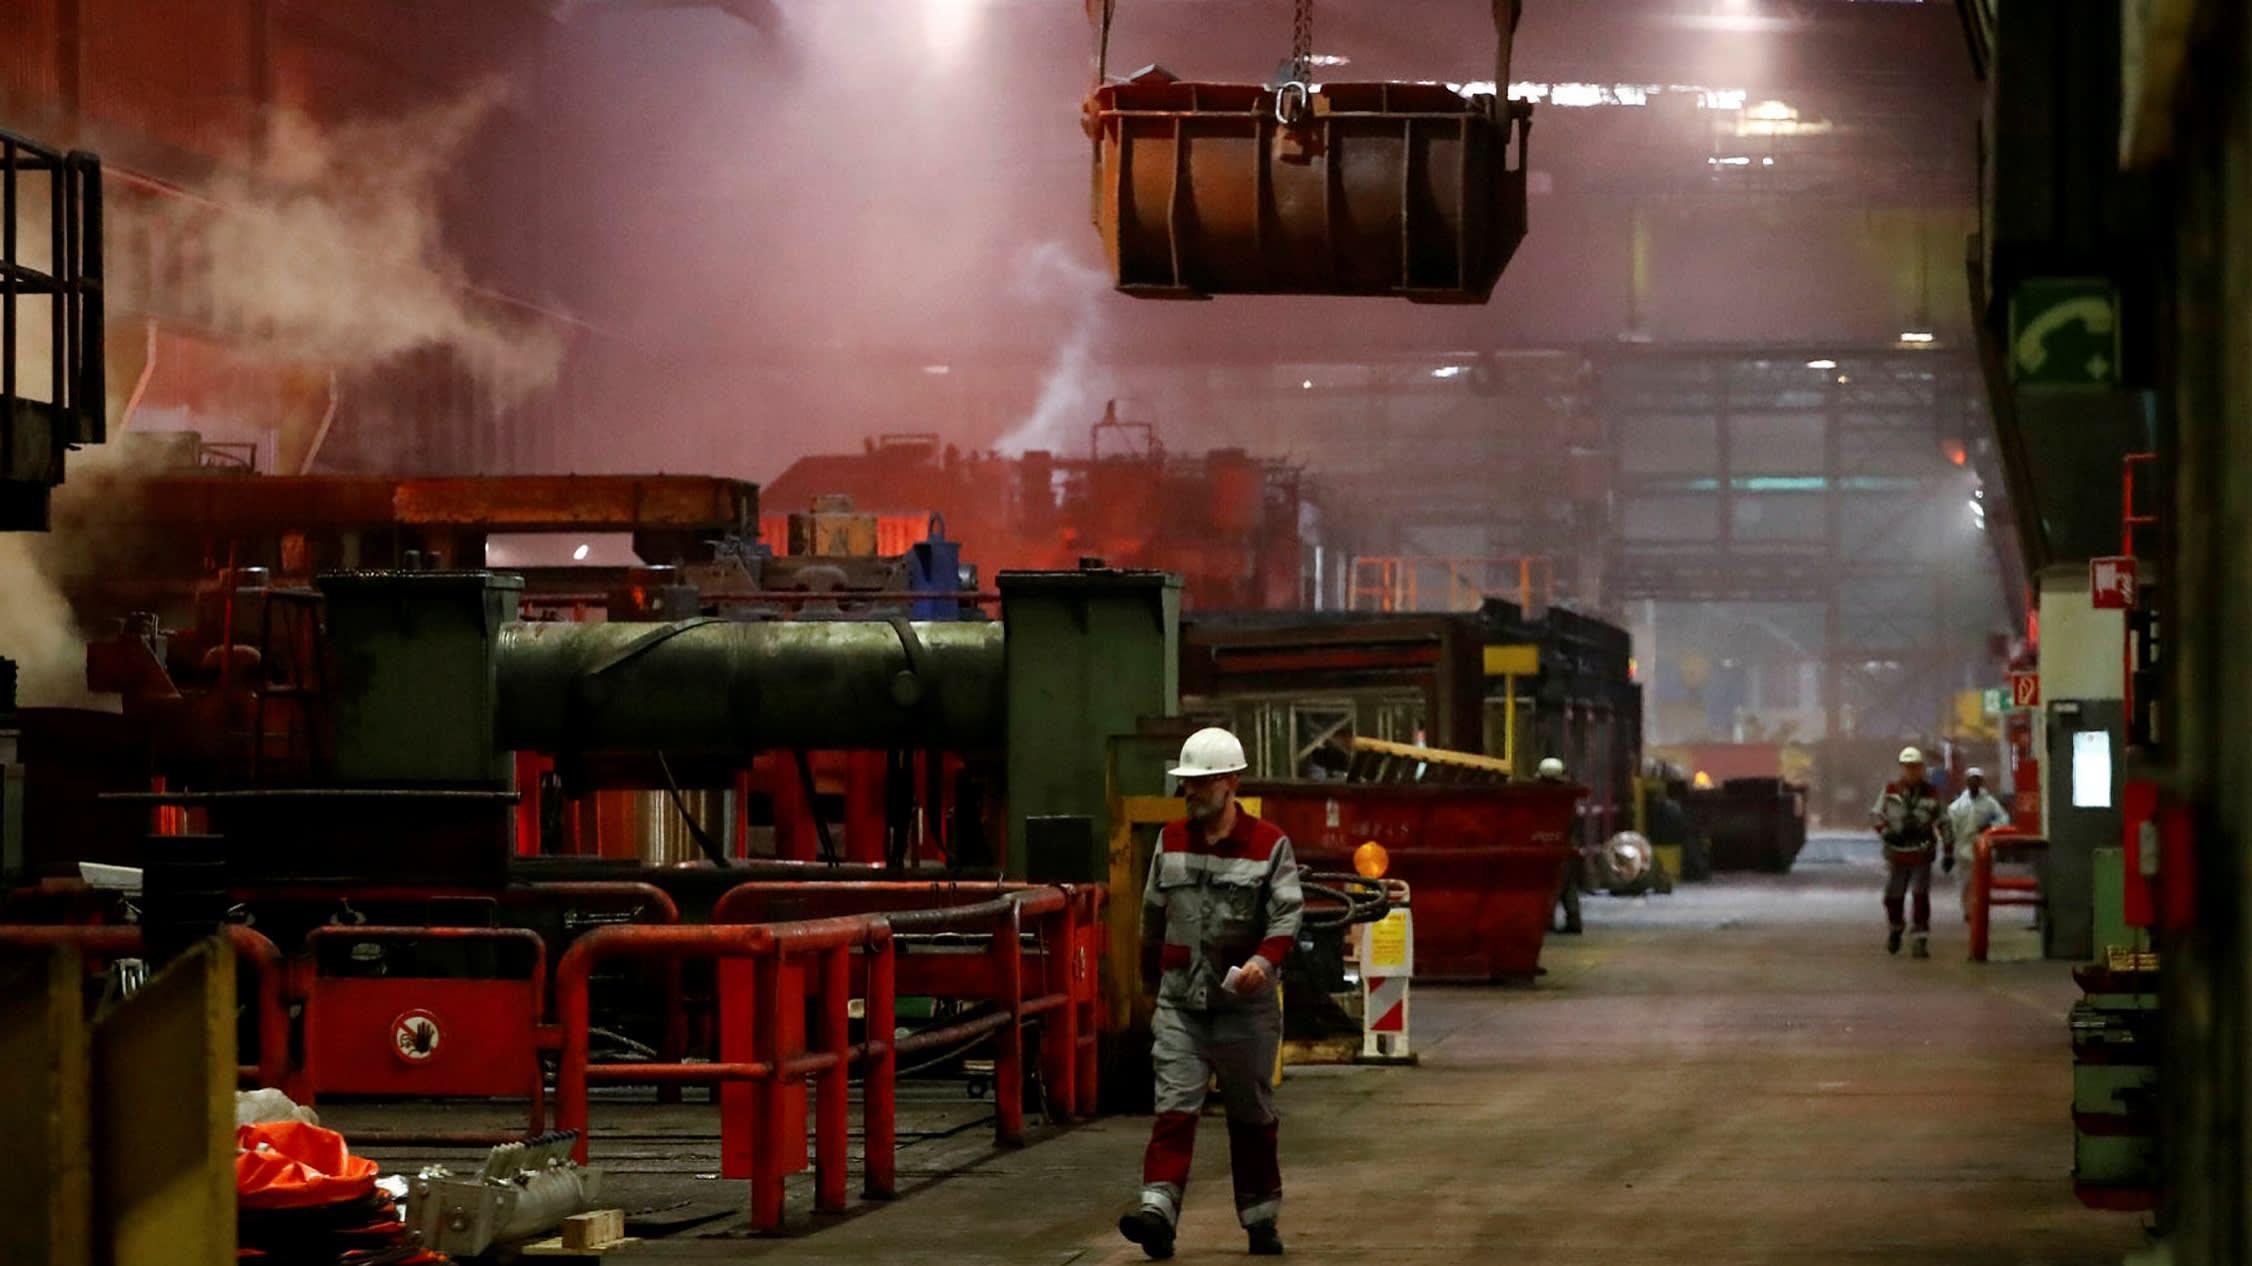 Thyssenkrupp's steel woes send shares tumbling